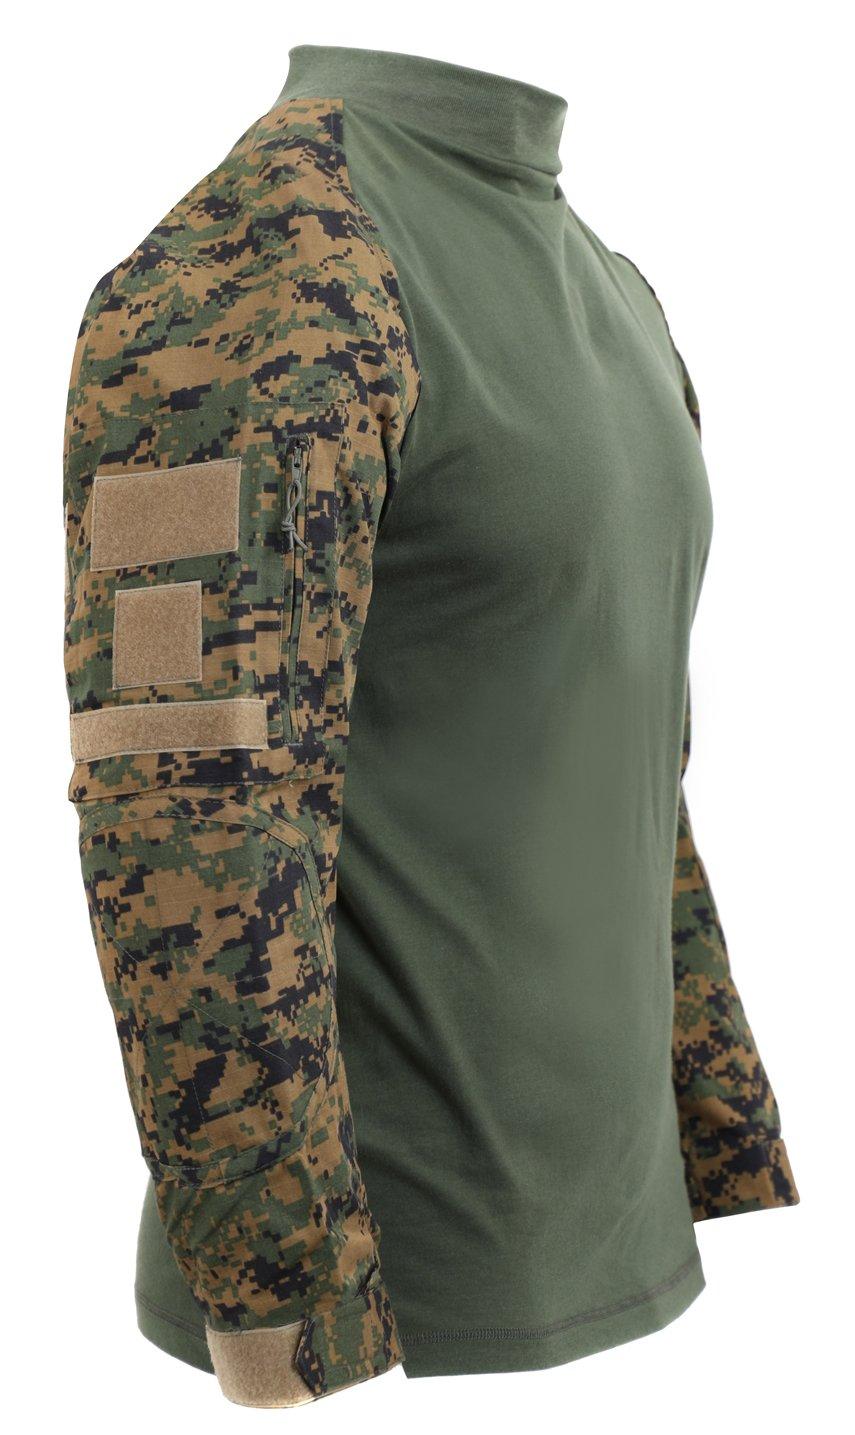 Rothco Tactical Airsoft Combat Shirt, Woodland Digital Camo, S